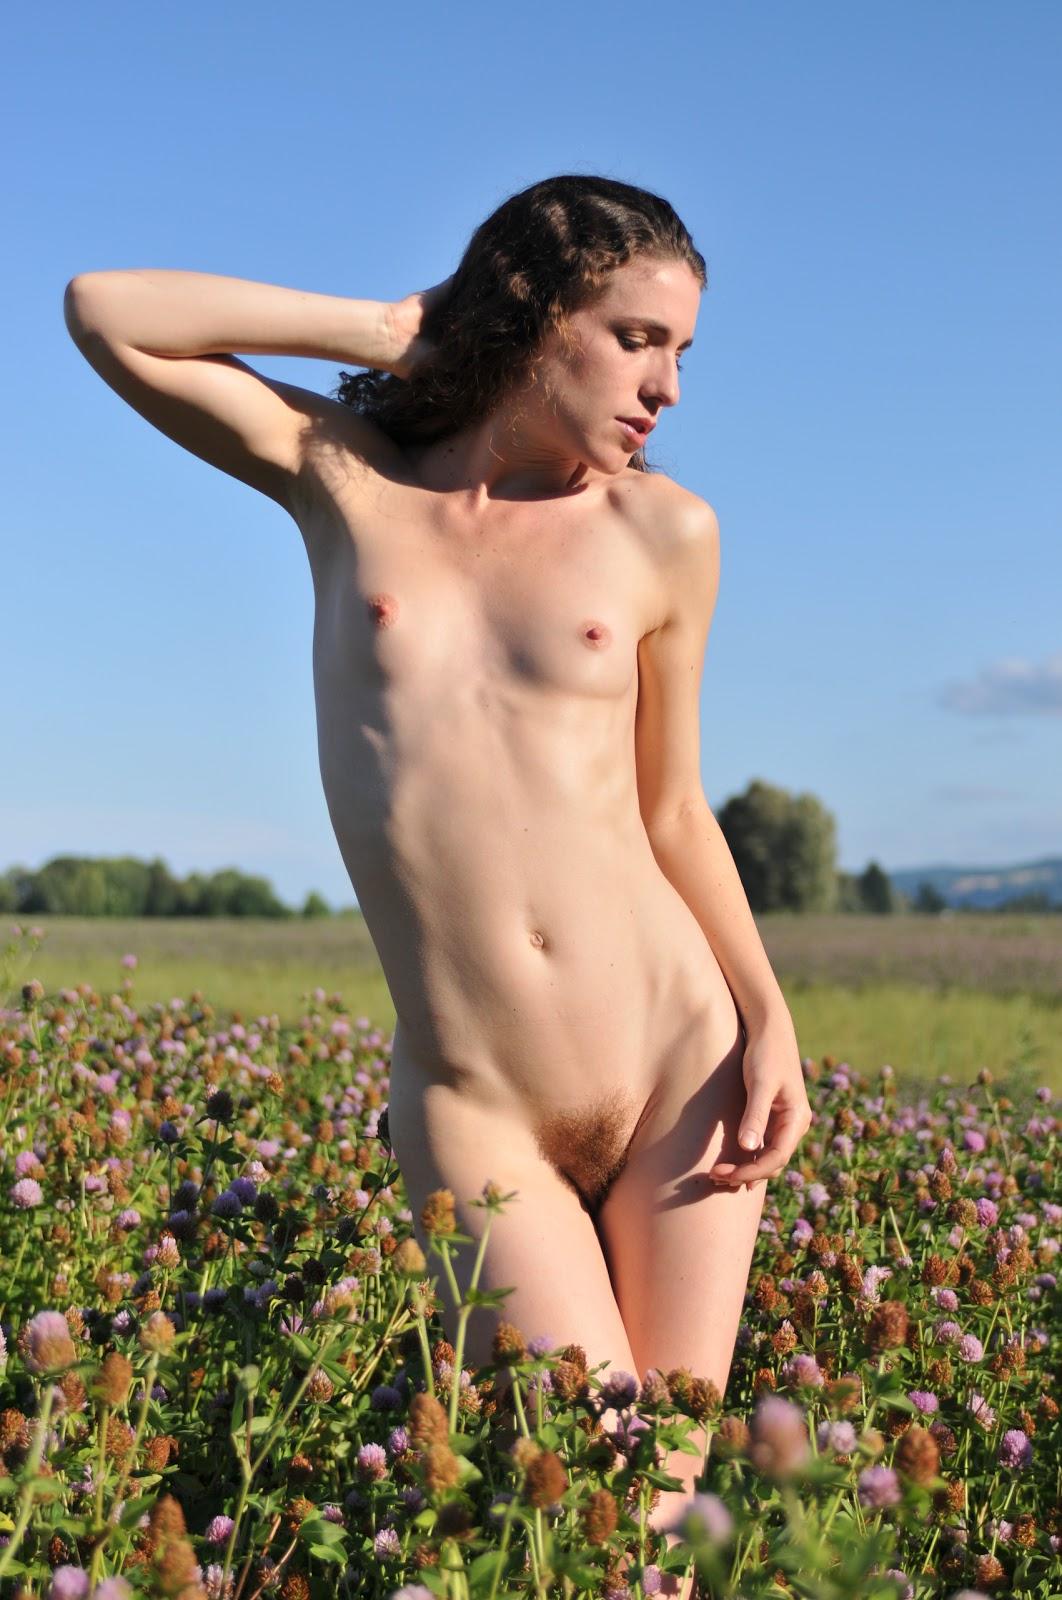 Big tit anal skirt